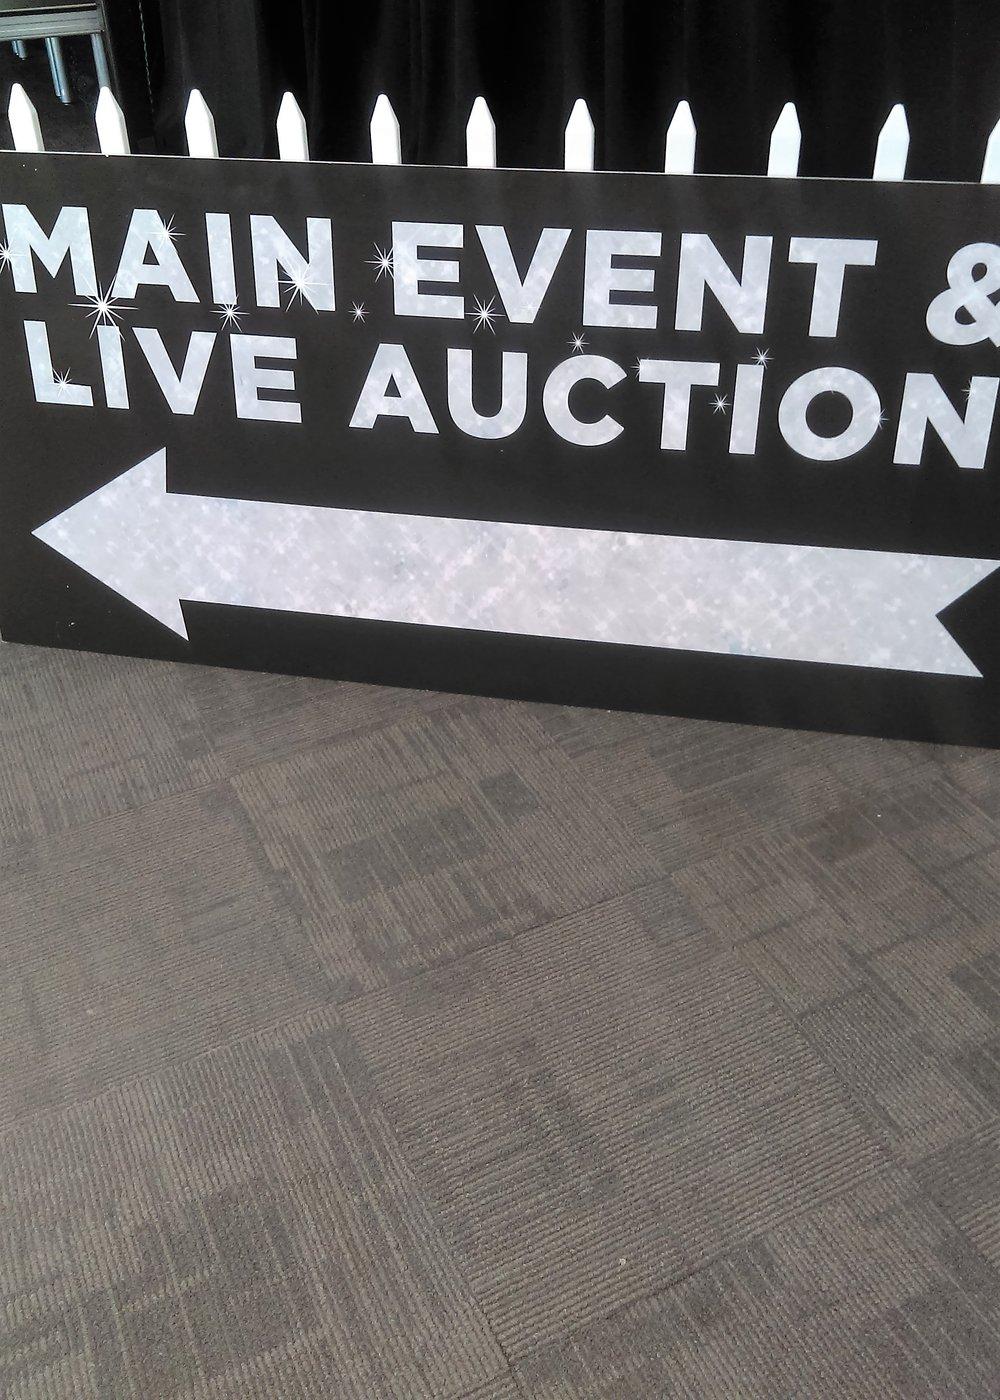 mian event& auction.jpg